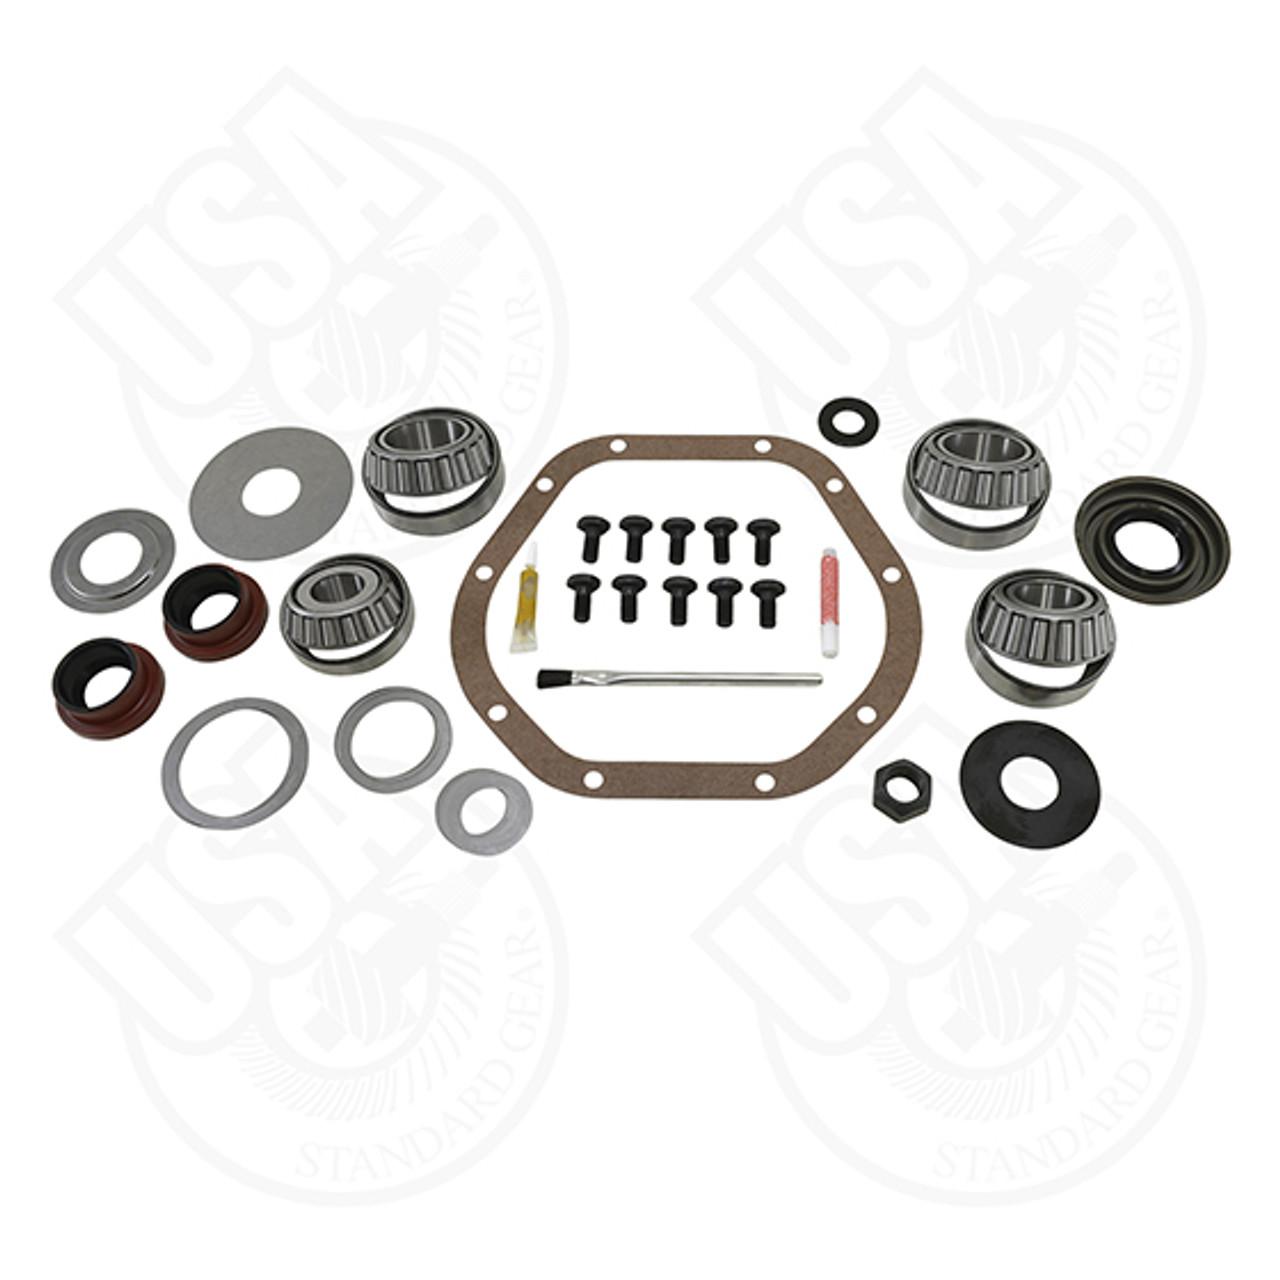 Dana 44 Front Standard Rotation Koyo Master Differential Bearing Kit